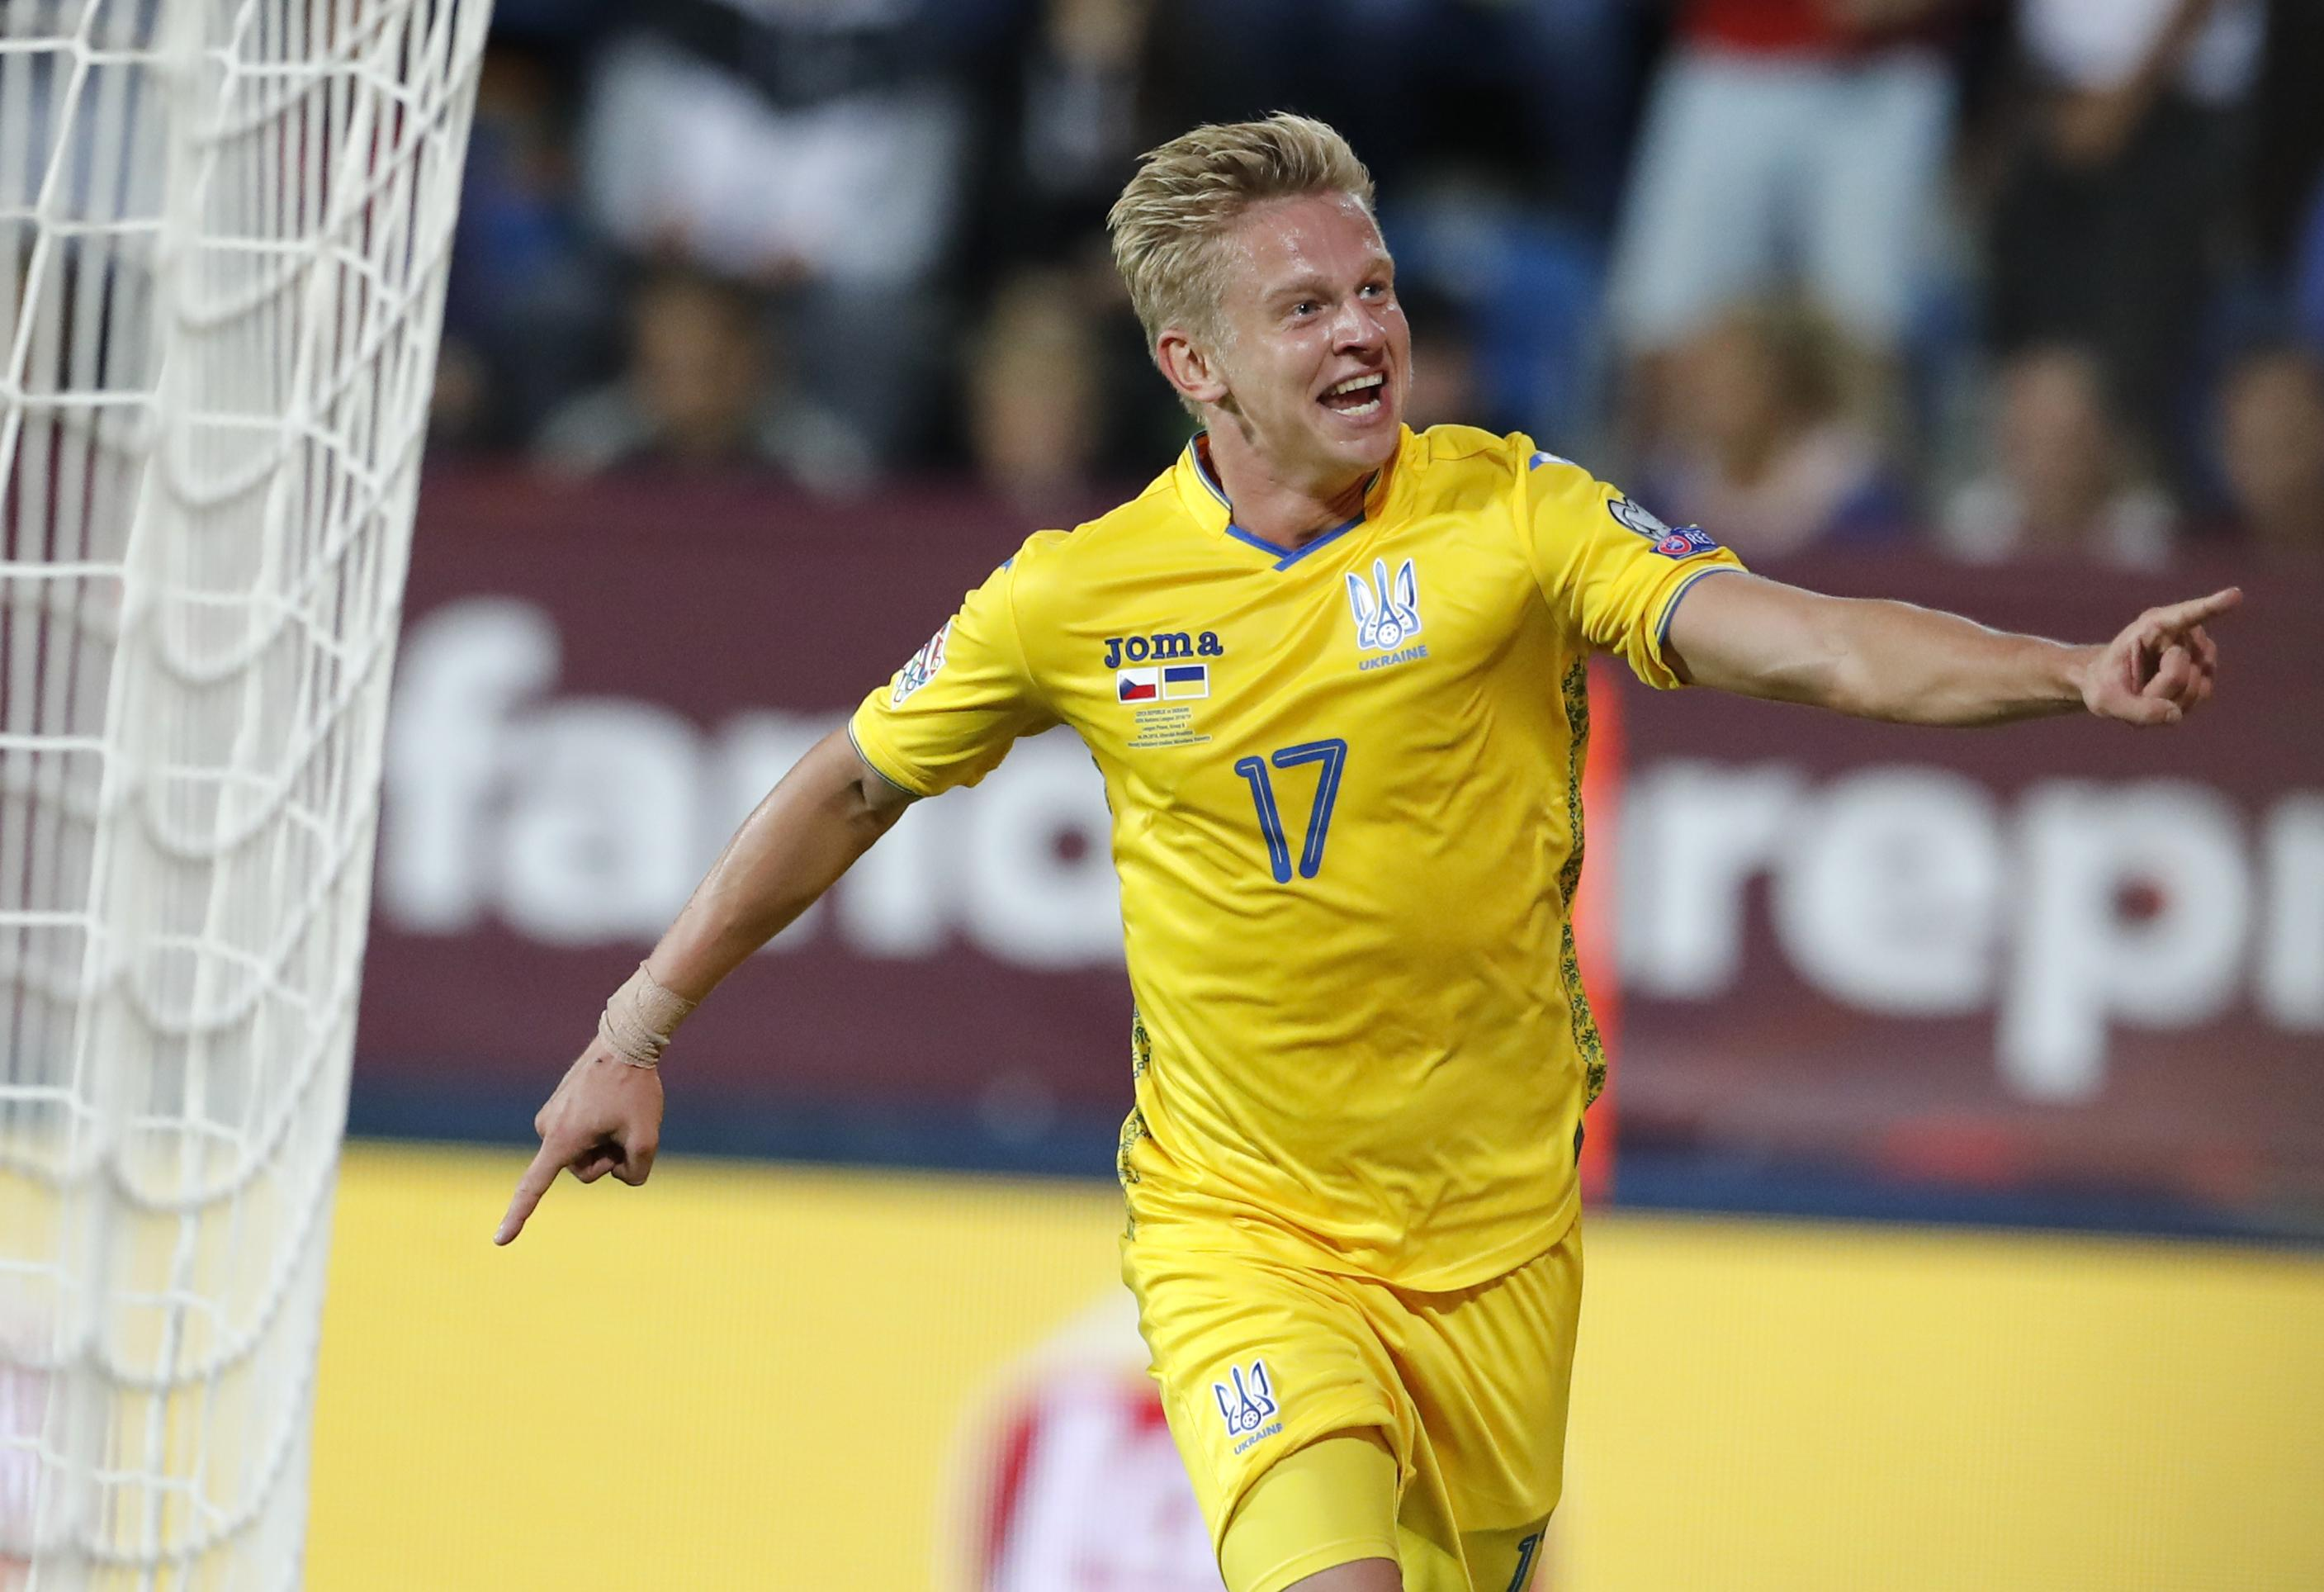 Manchester City's Olexandr Zinchenko grabbed an injury-time winner for Ukraine